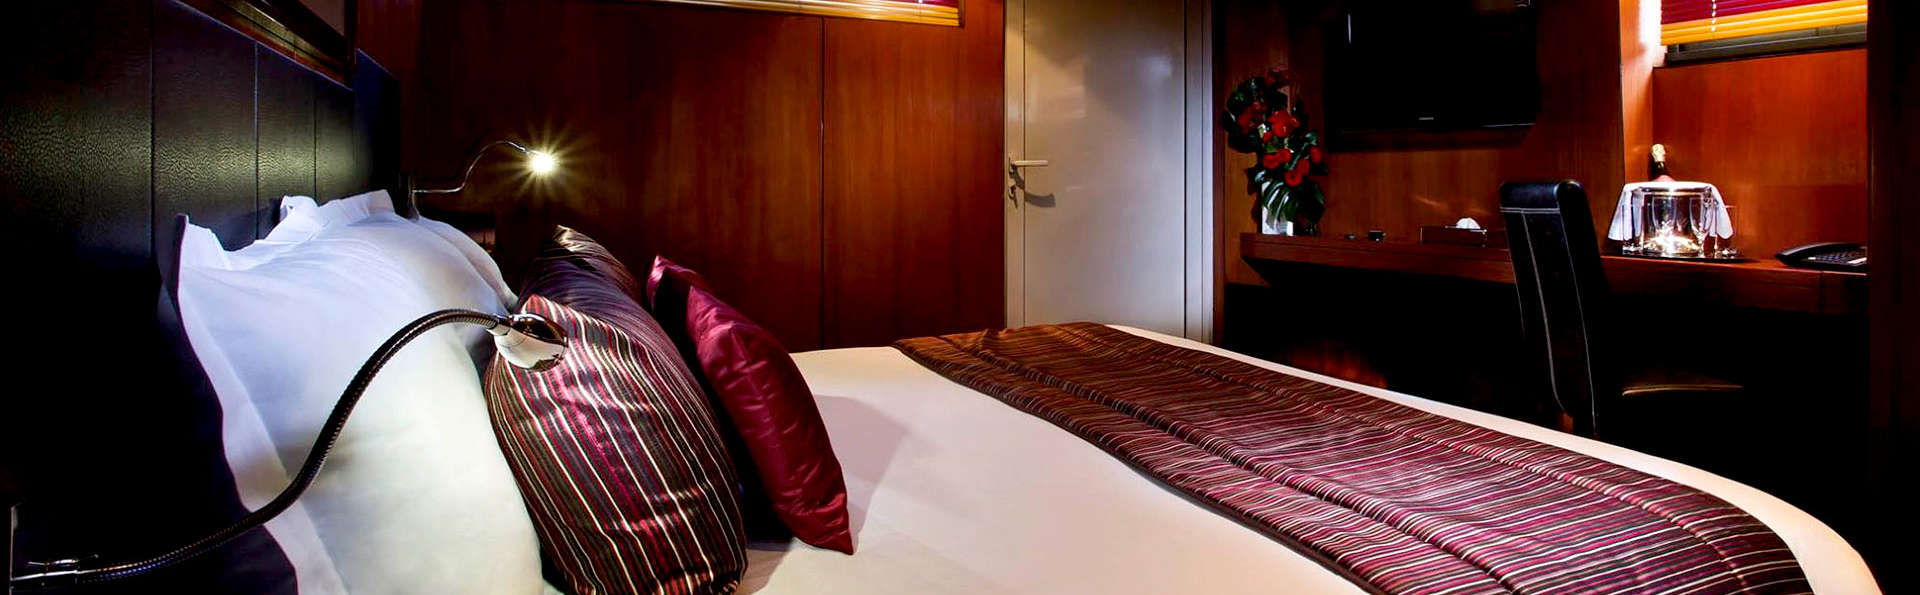 VIP Paris Yacht Hotel - Edit_Room2.jpg